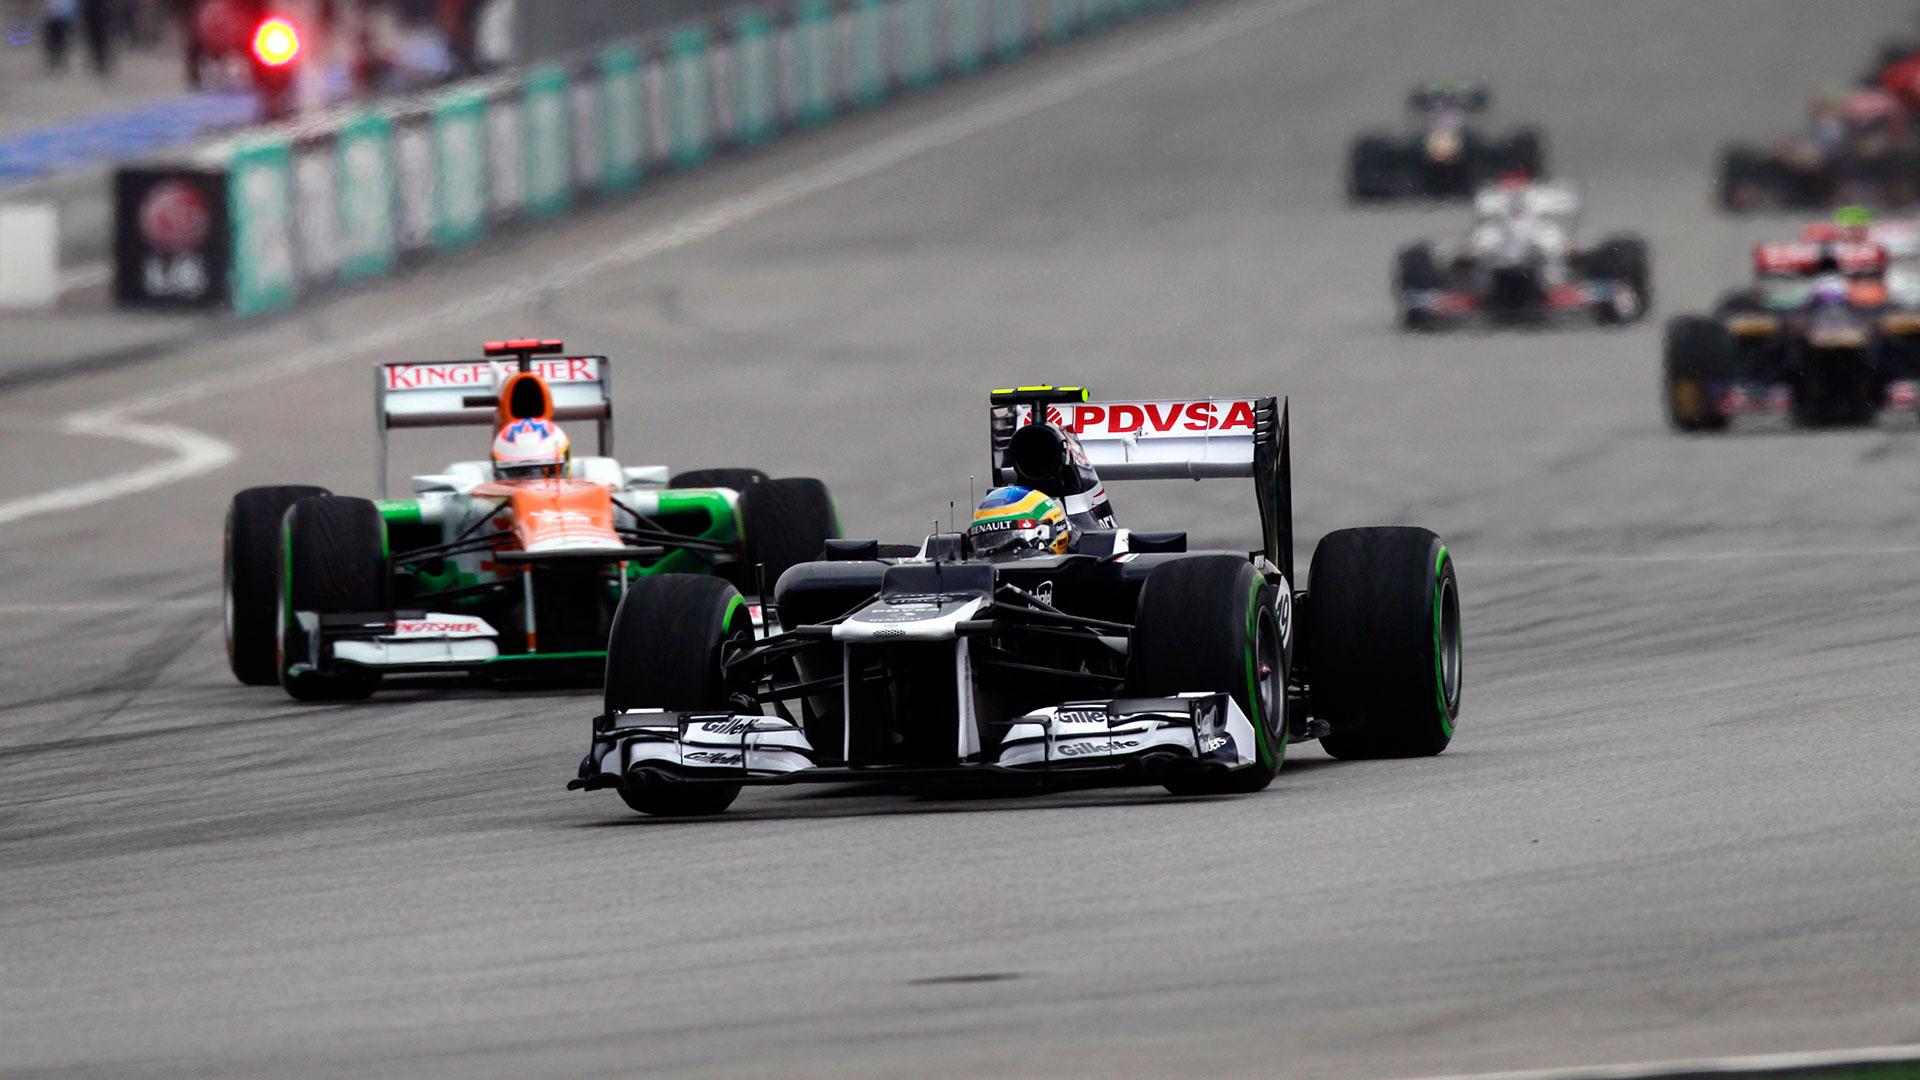 HD Wallpapers 2012 Formula 1 Grand Prix of Malaysia